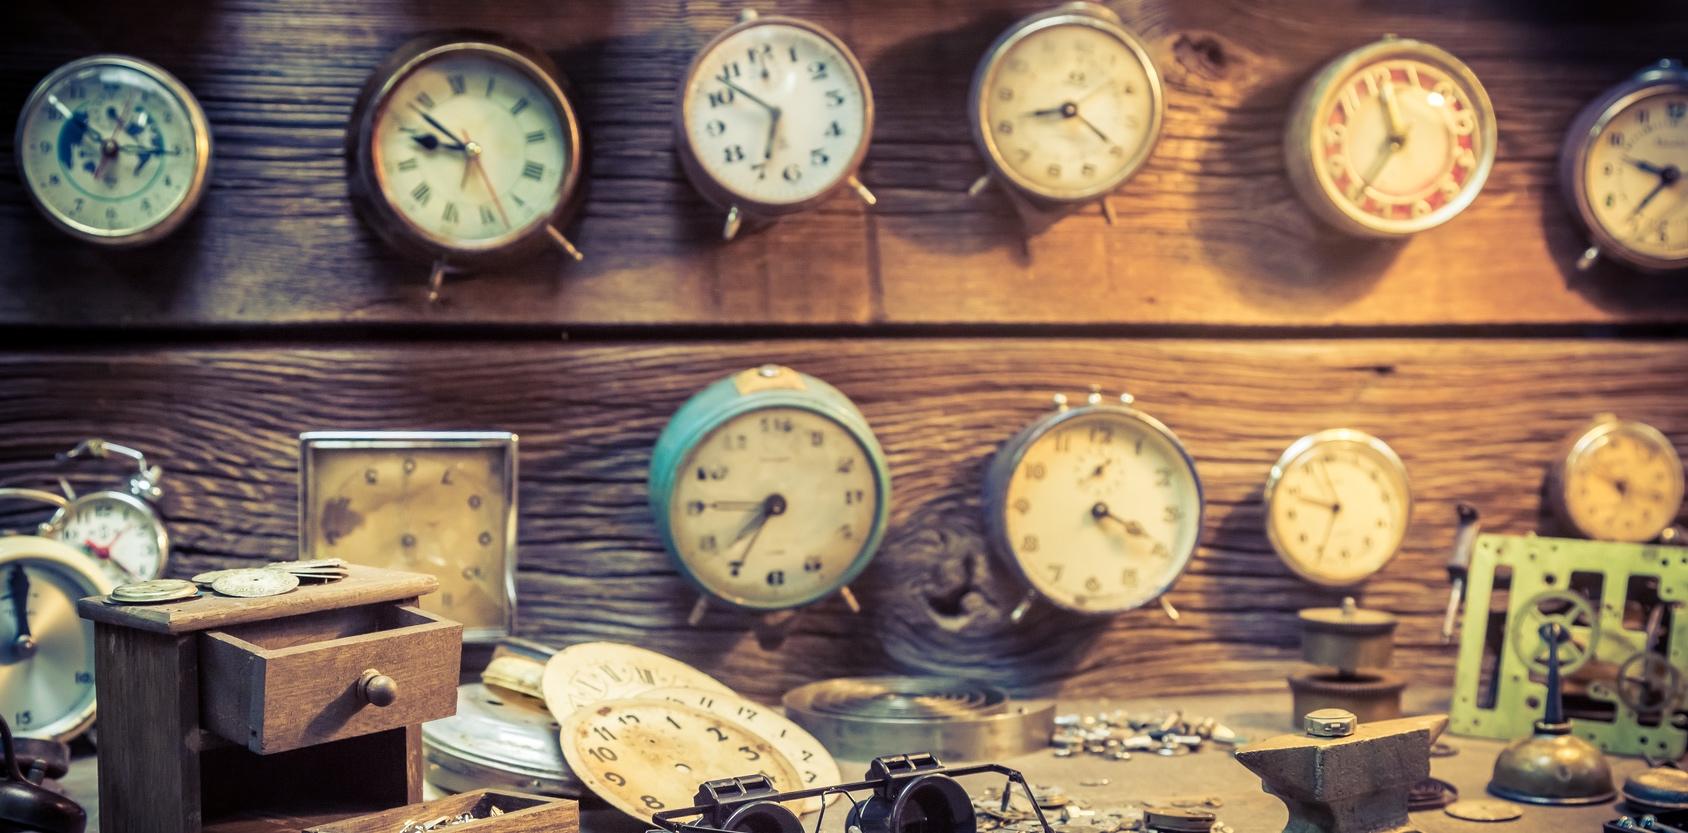 Old watchmaker's room full of clocks